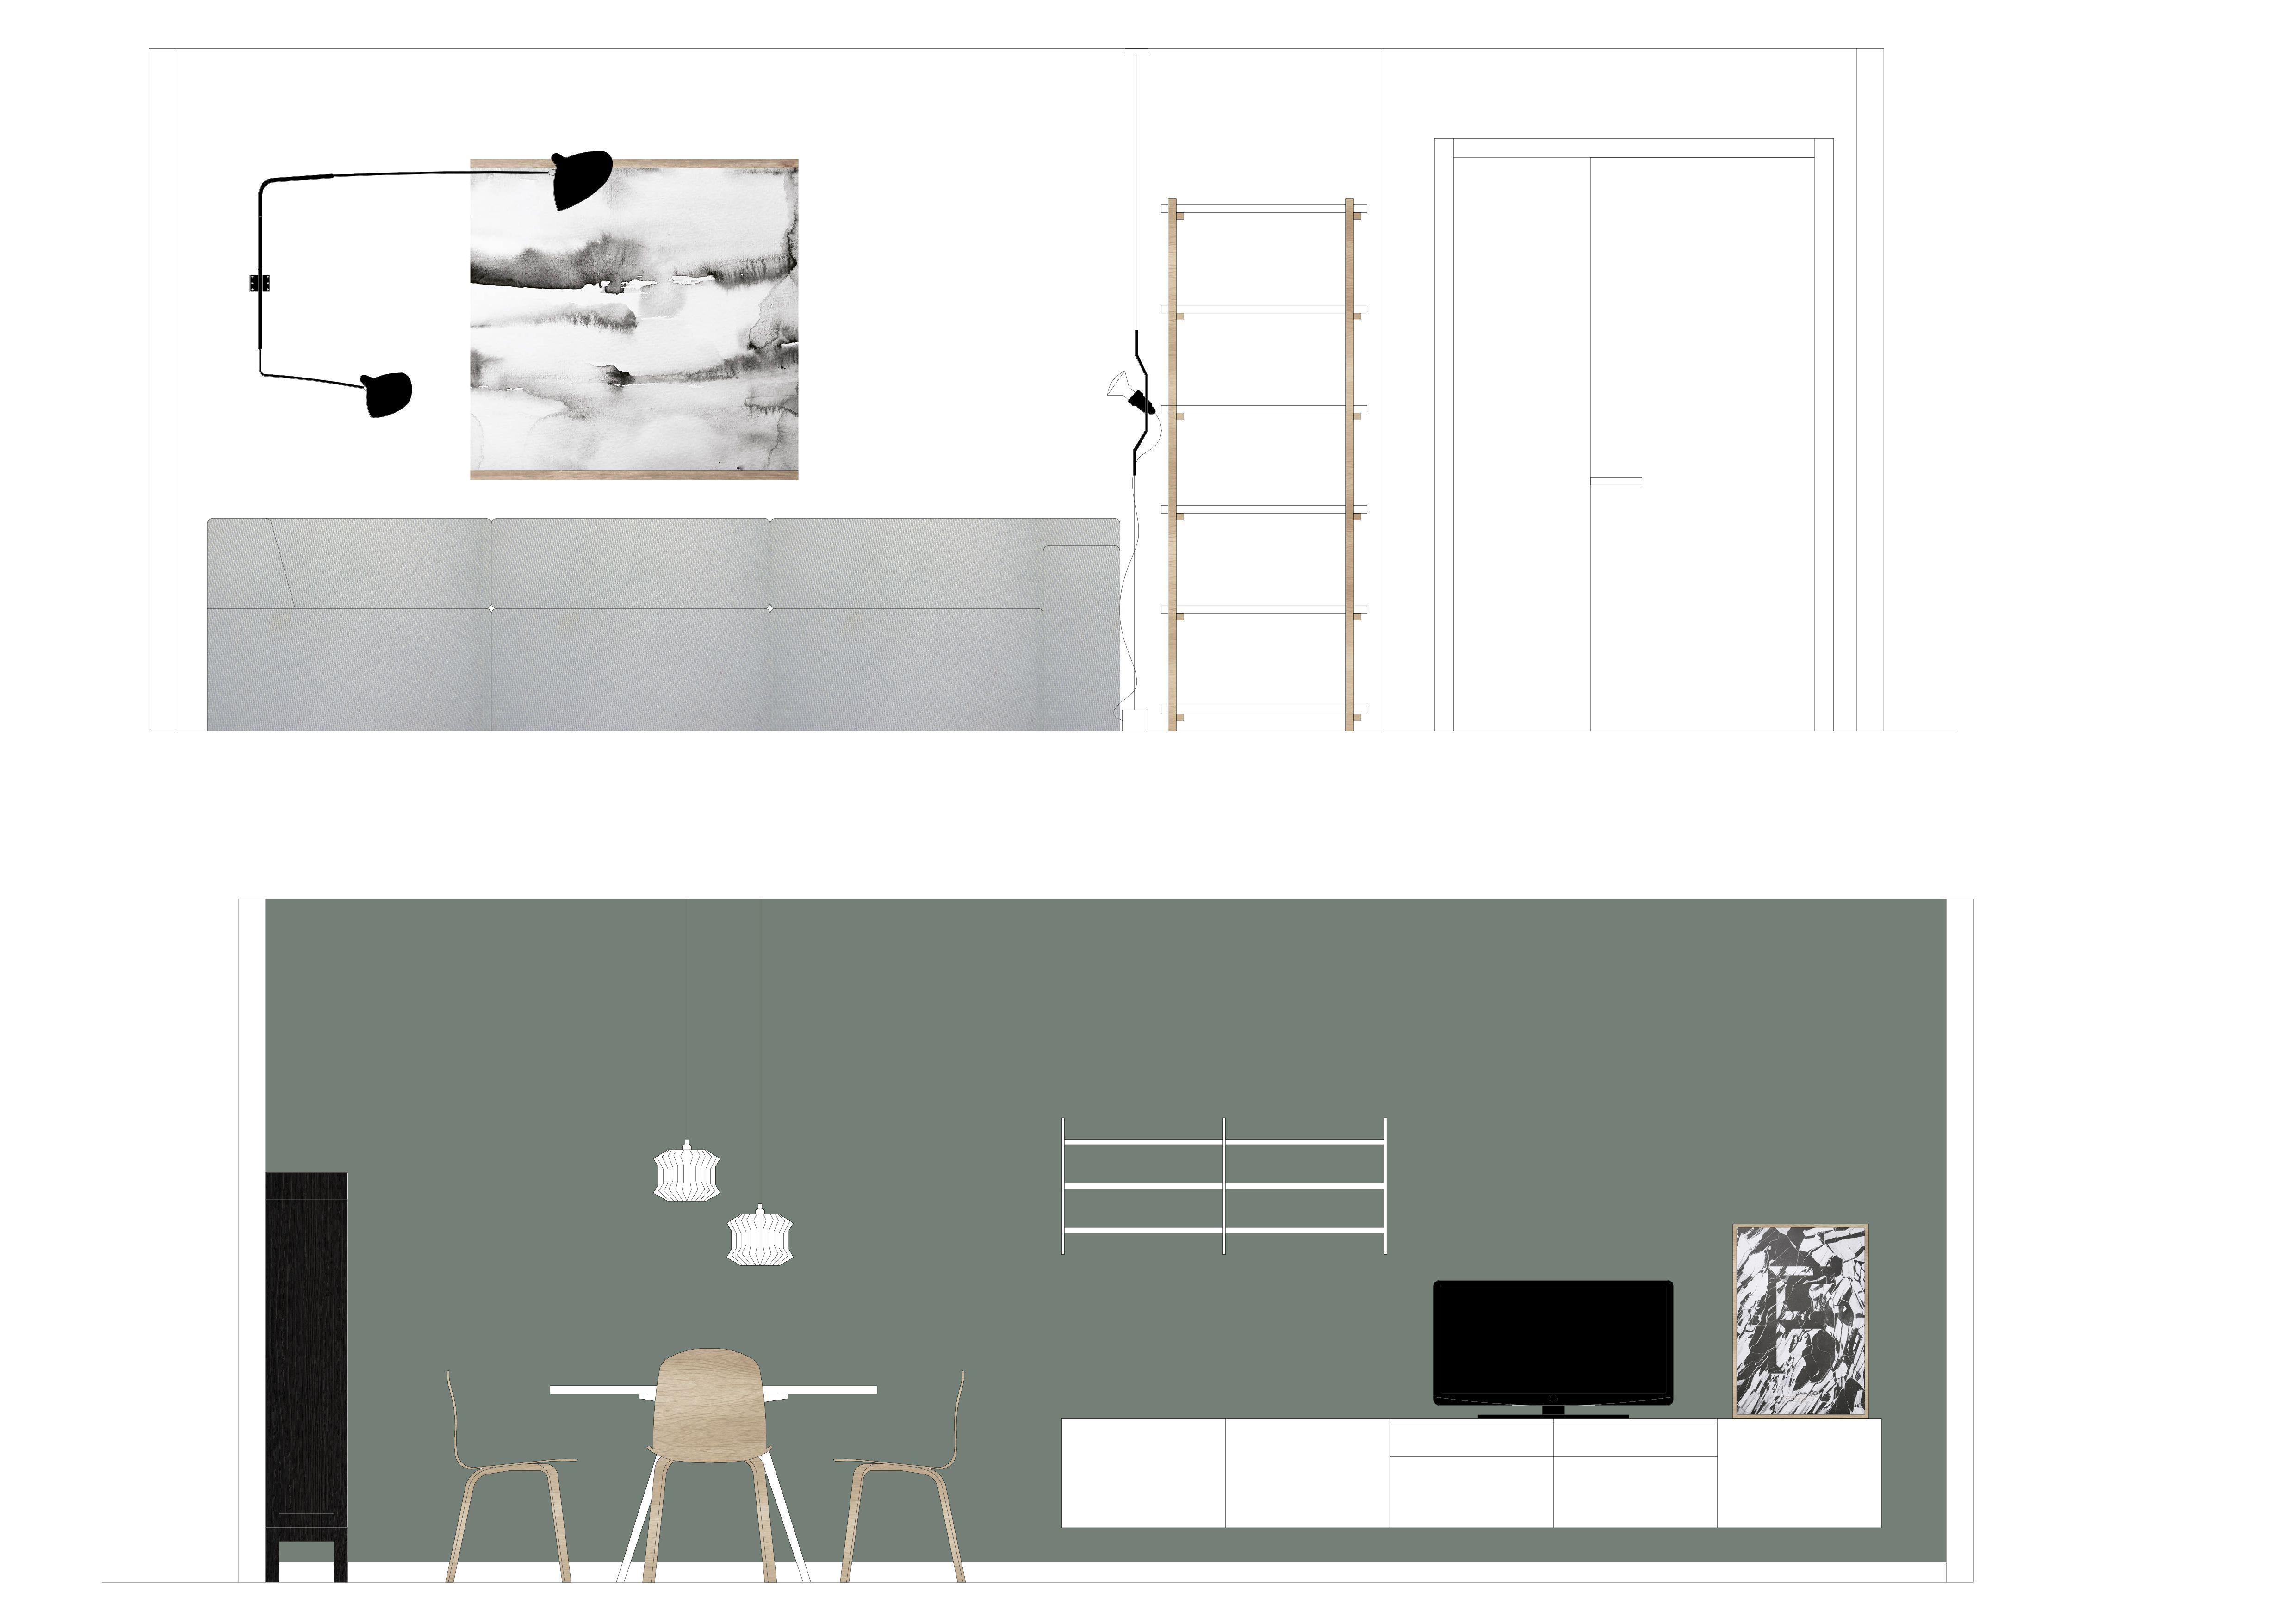 Asesoramiento decoracion salon dise o comedor - Proyecto diseno de interiores ...